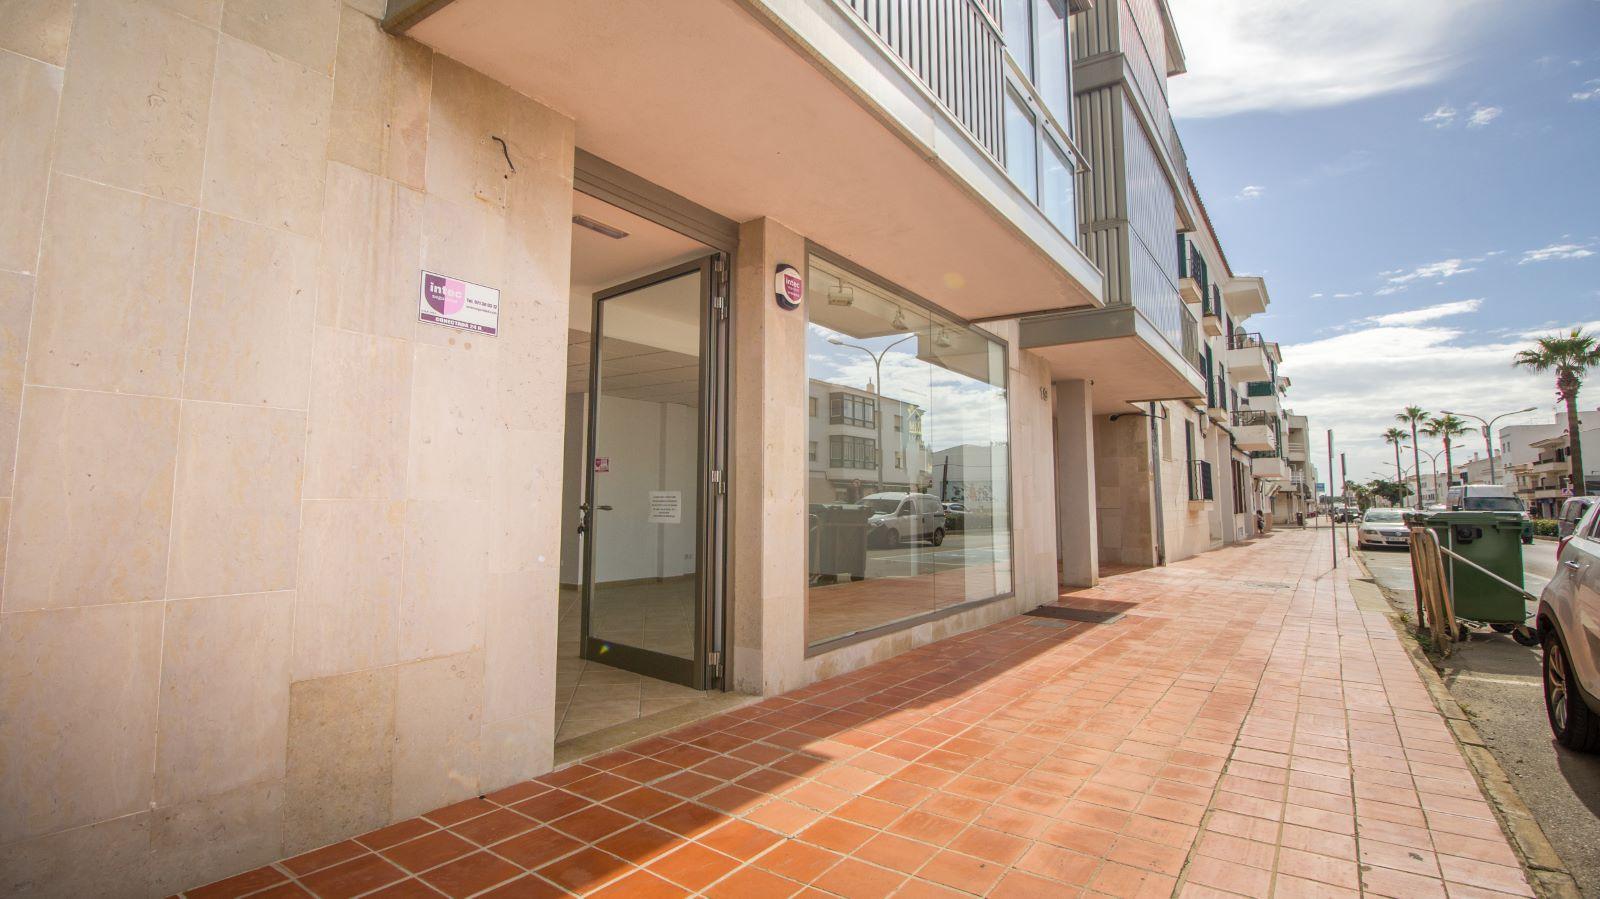 Local comercial en Sant Lluís Ref: S1715 1